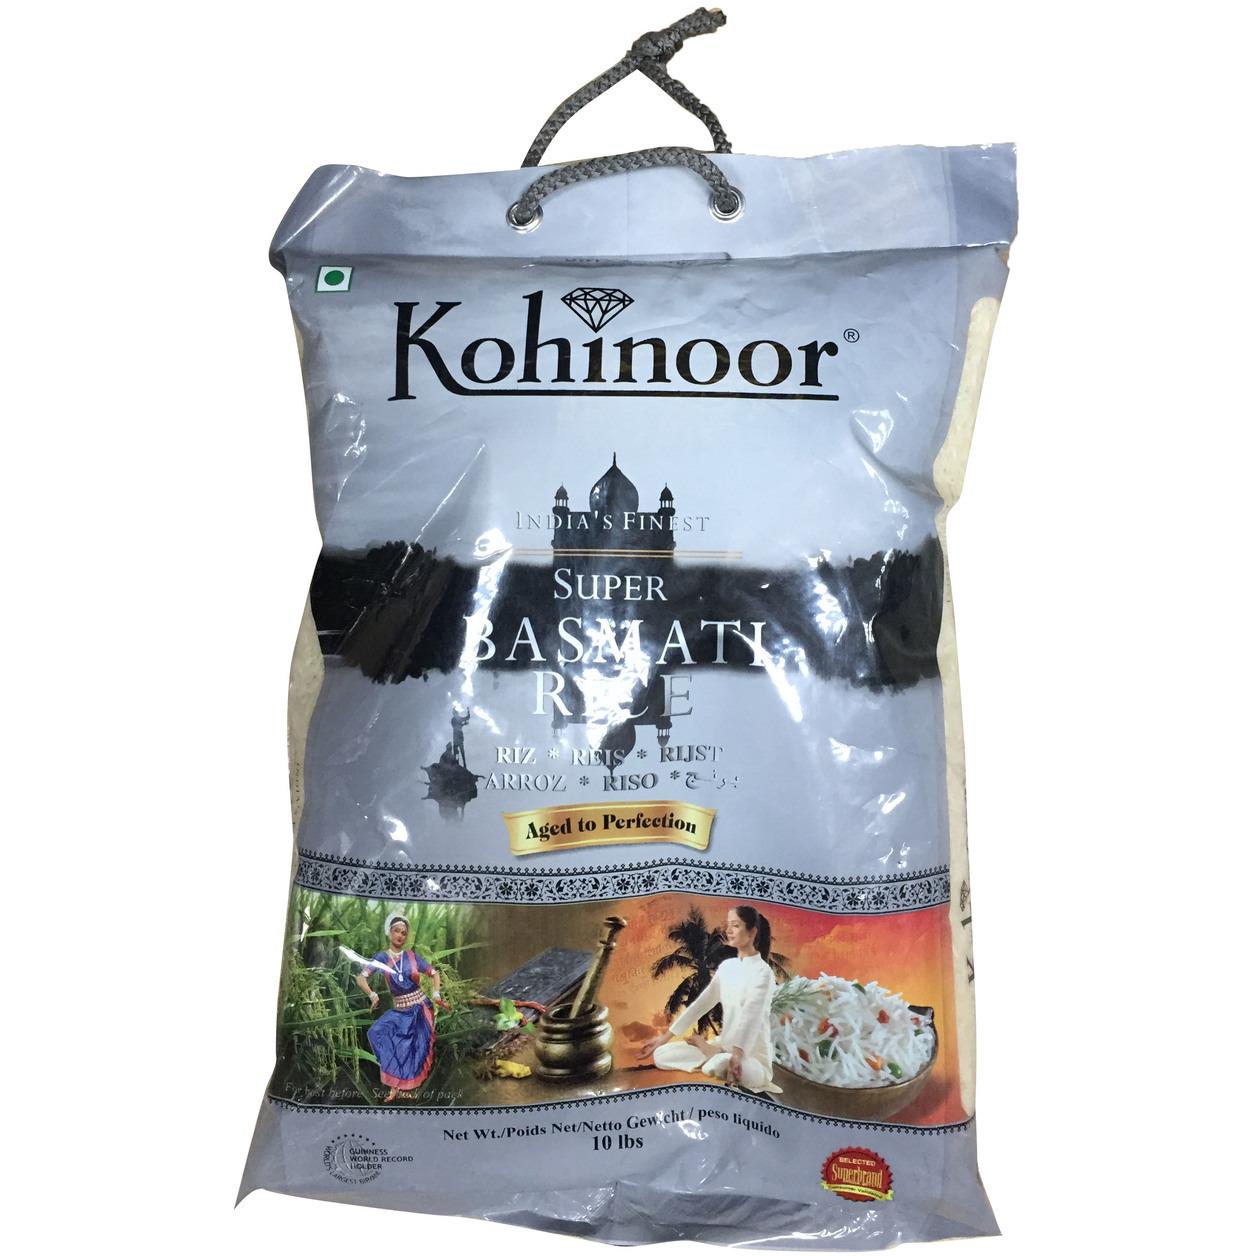 Kohinoor Indian Fashion N Beauty Brisbane: Buy Online Kohinoor Basmati Rice Silver 10 Lb From USA